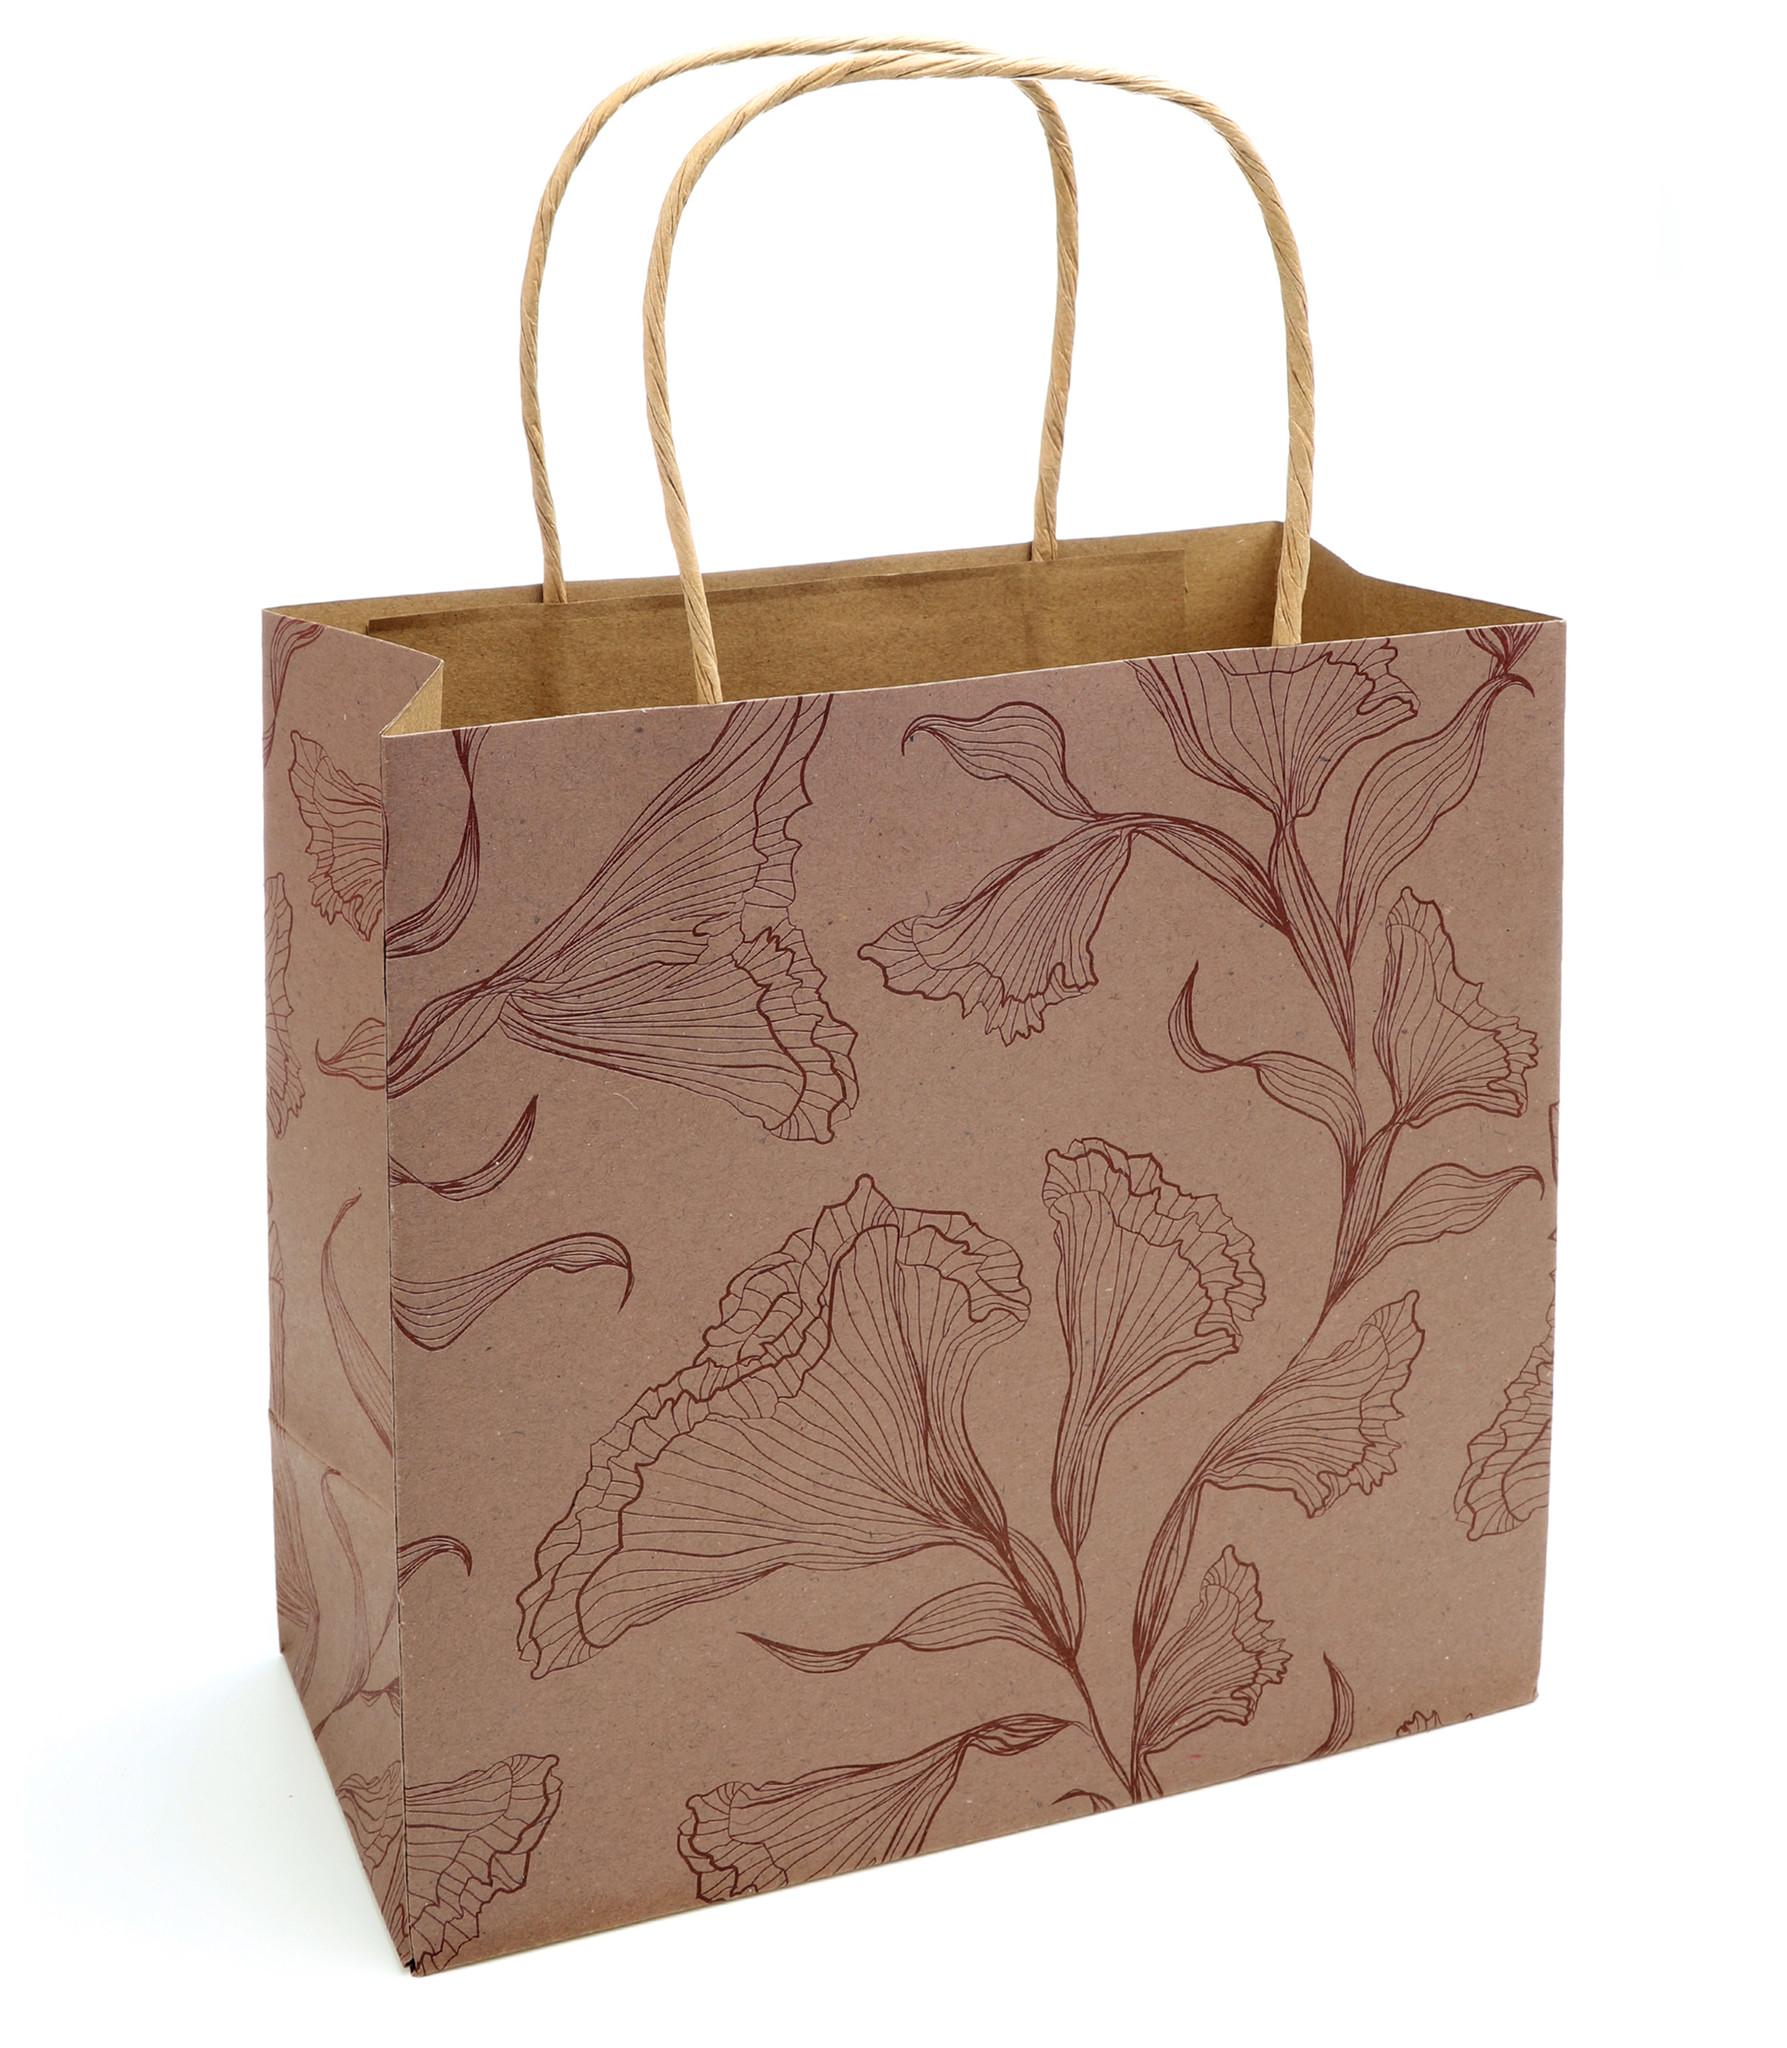 Floralice Papiertasche - Marble Rose - 5 Stück